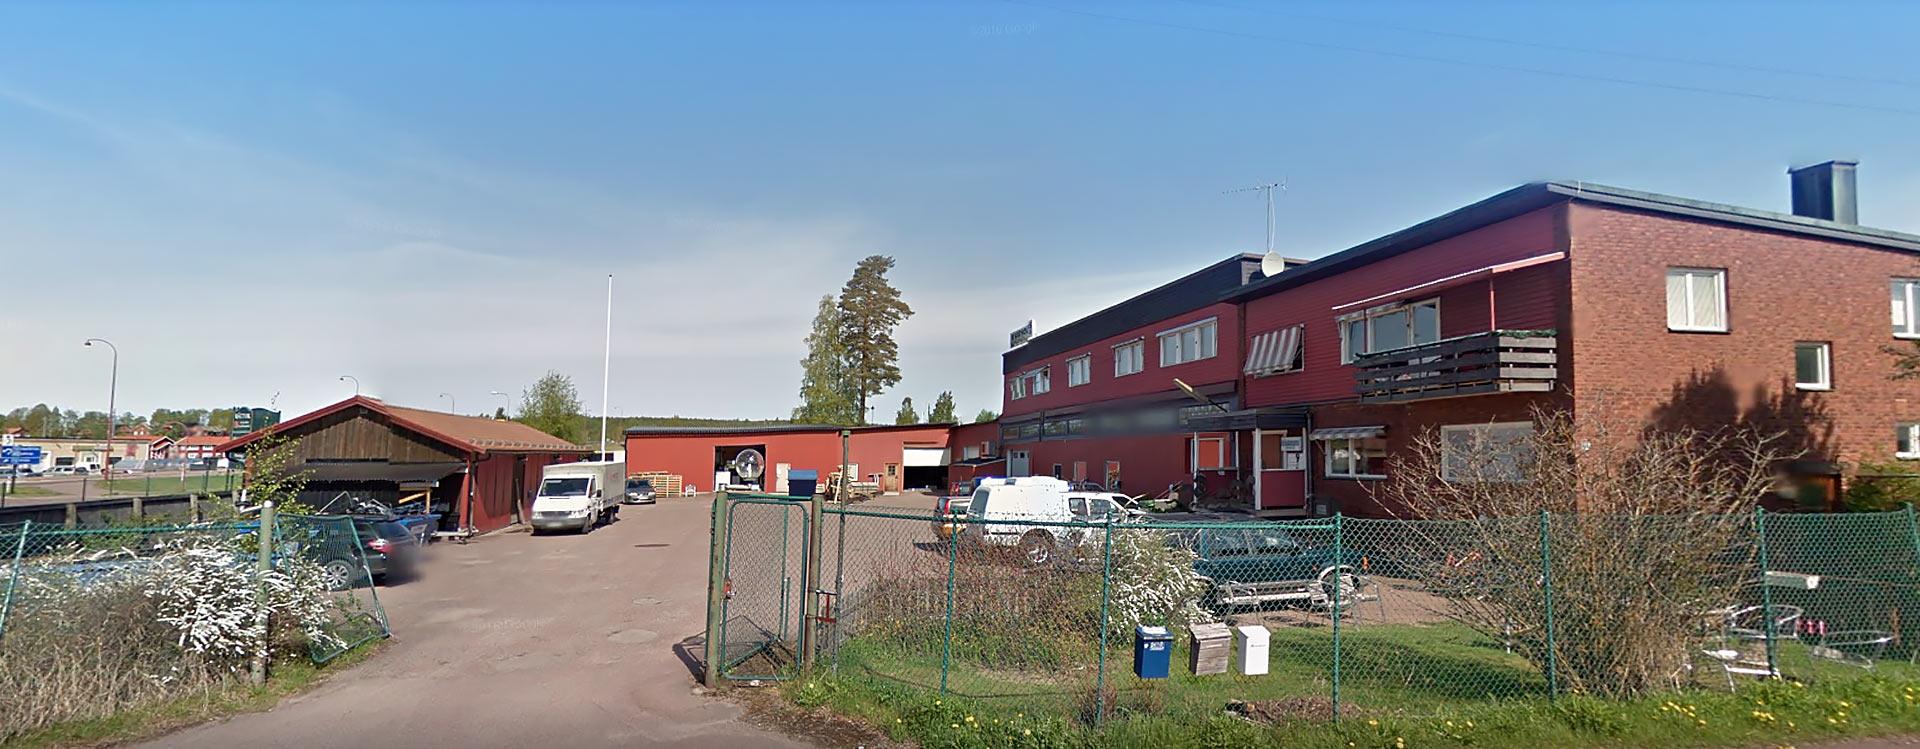 Sarholms plåtdetaljer - Mekanisk verkstad